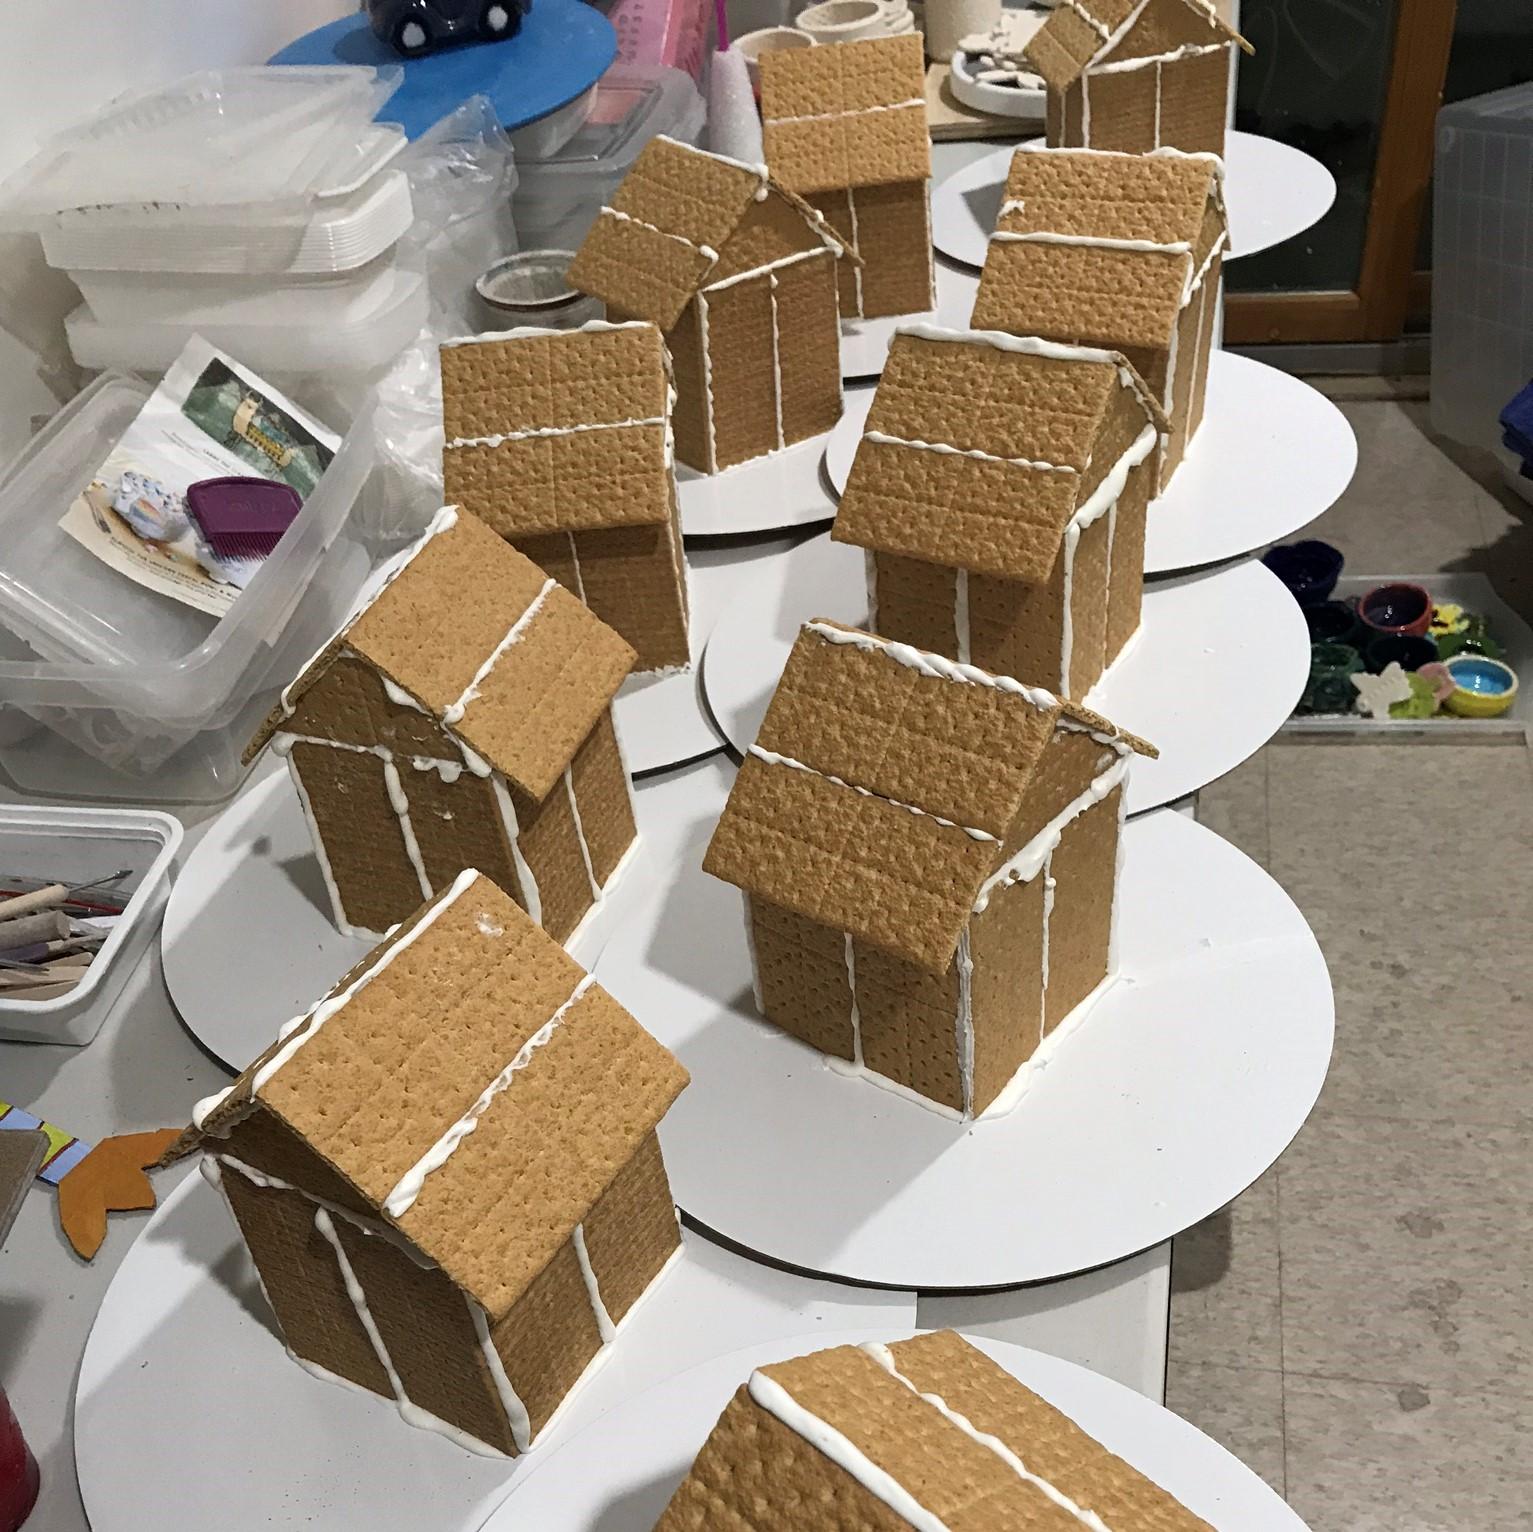 gingerbread house 4.jpeg